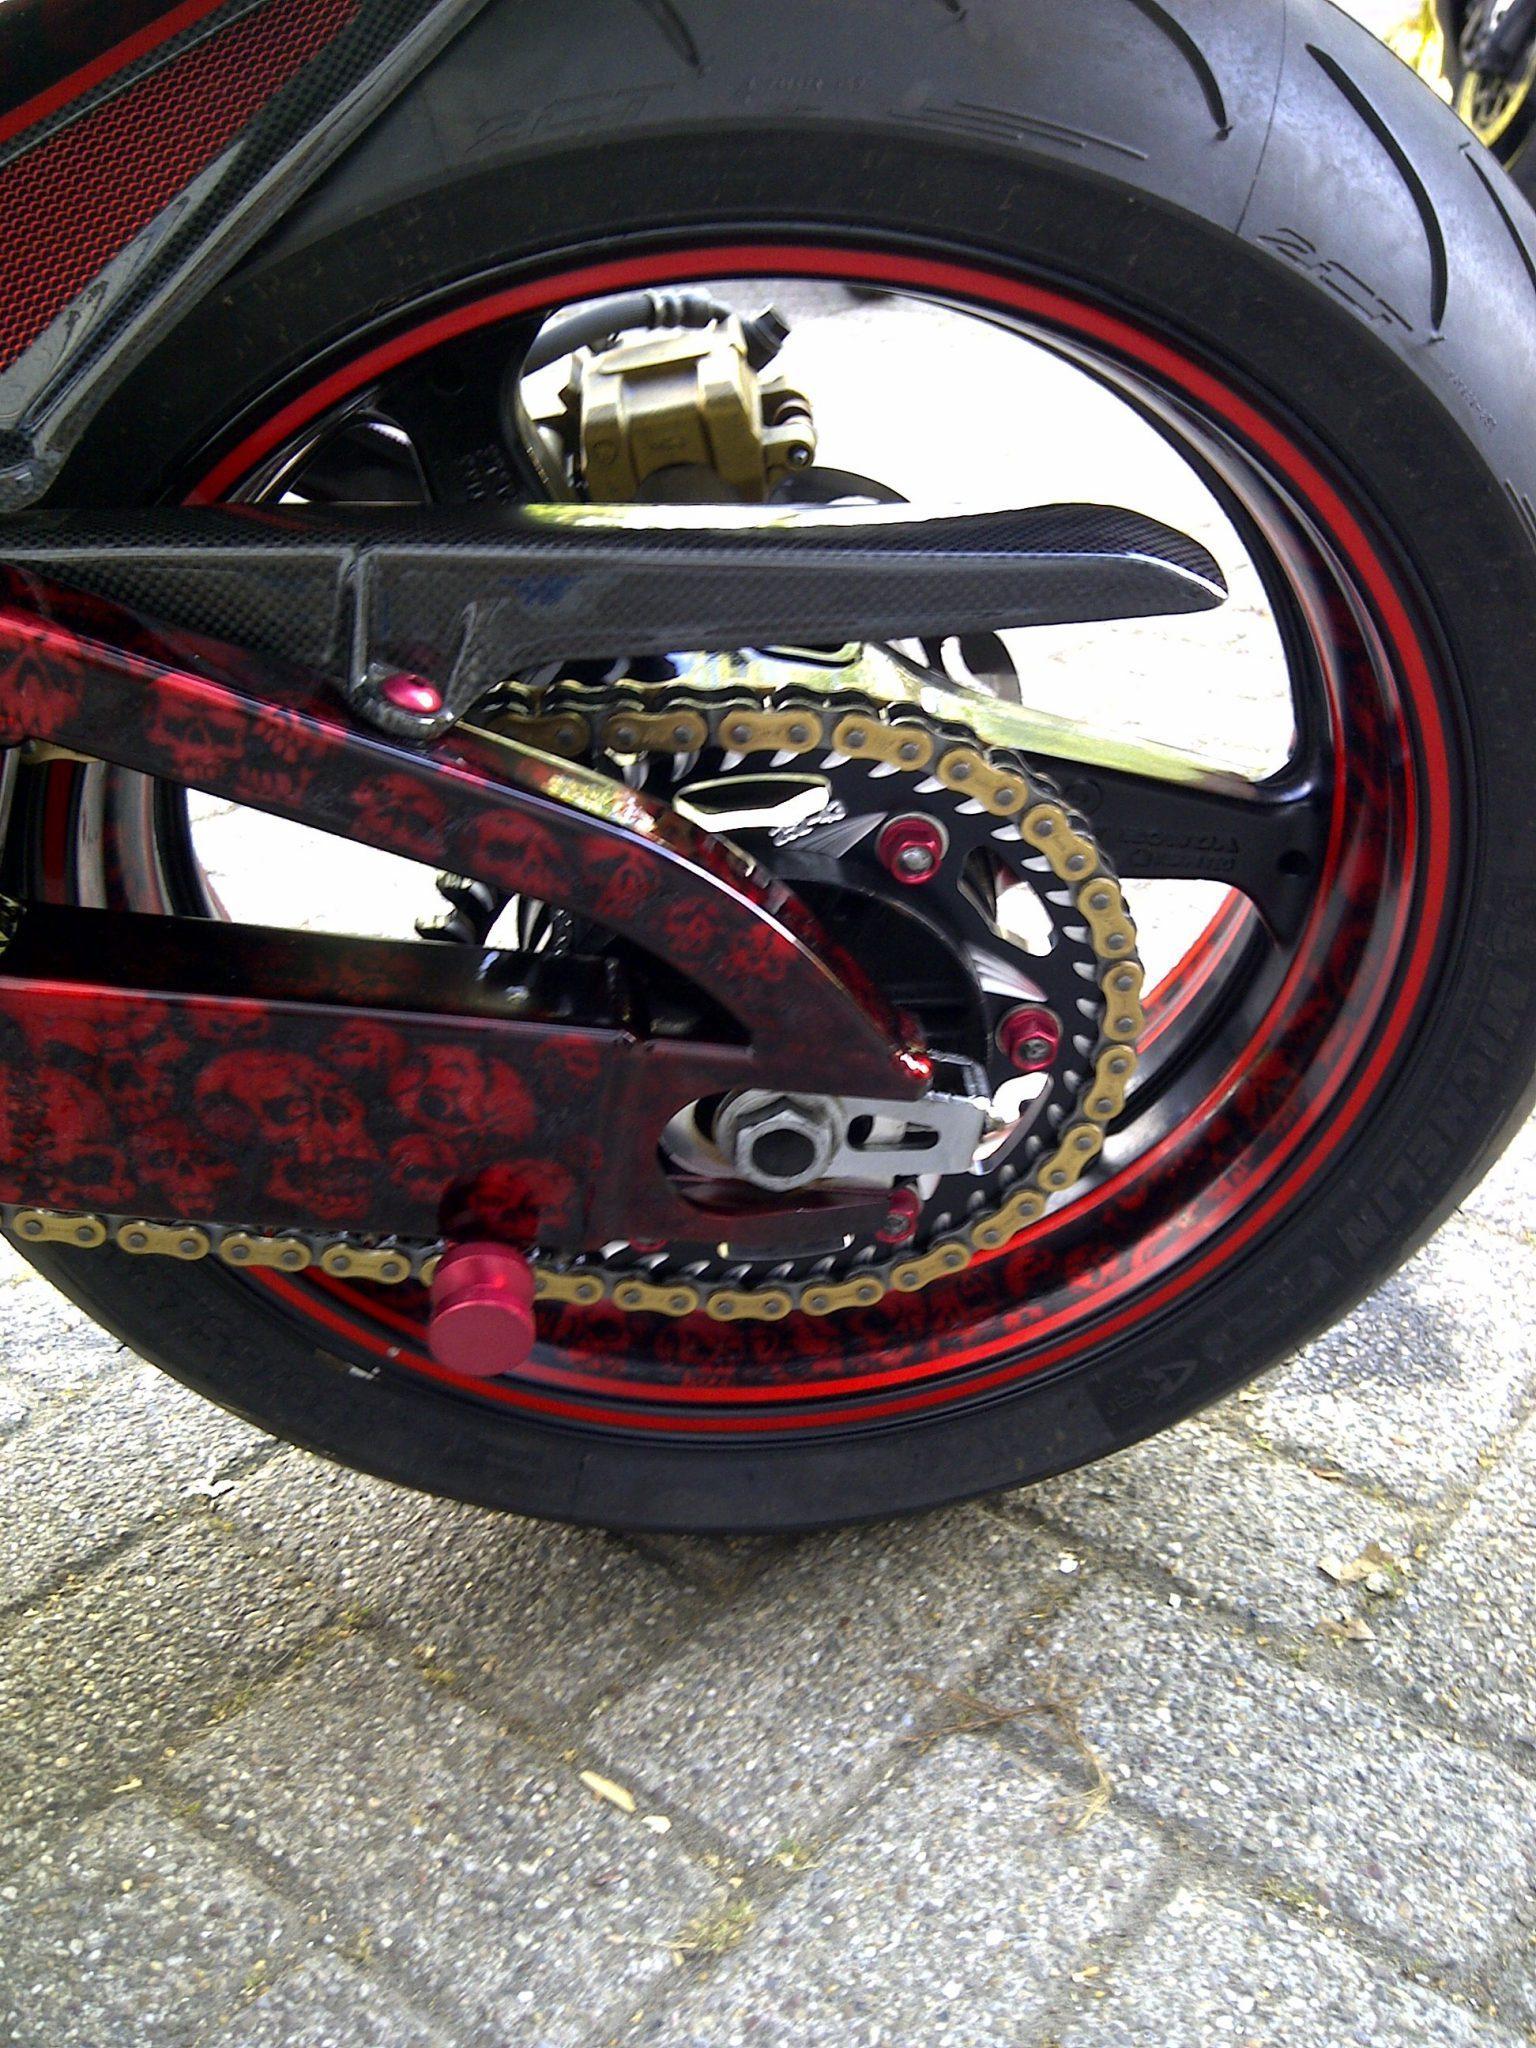 Honda CBR600rr 2004 Full Carbon 6